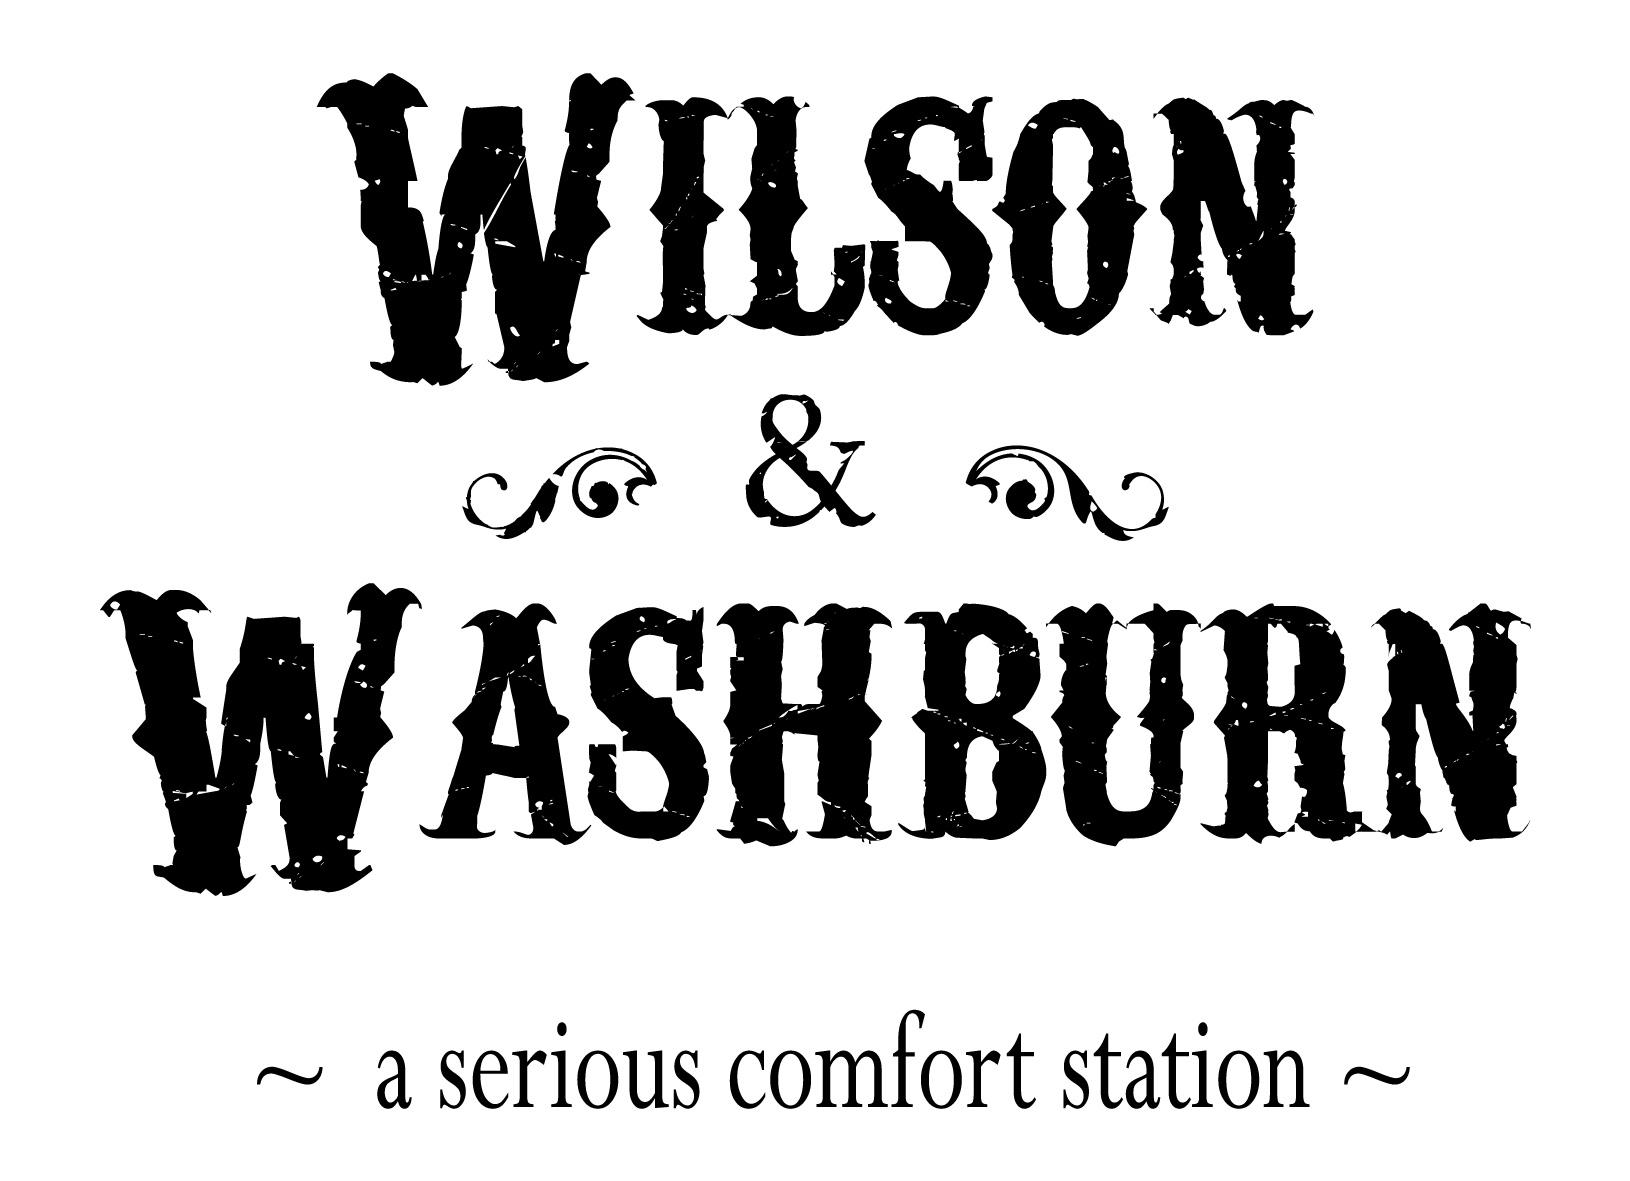 Wilson_and_washburn.jpg